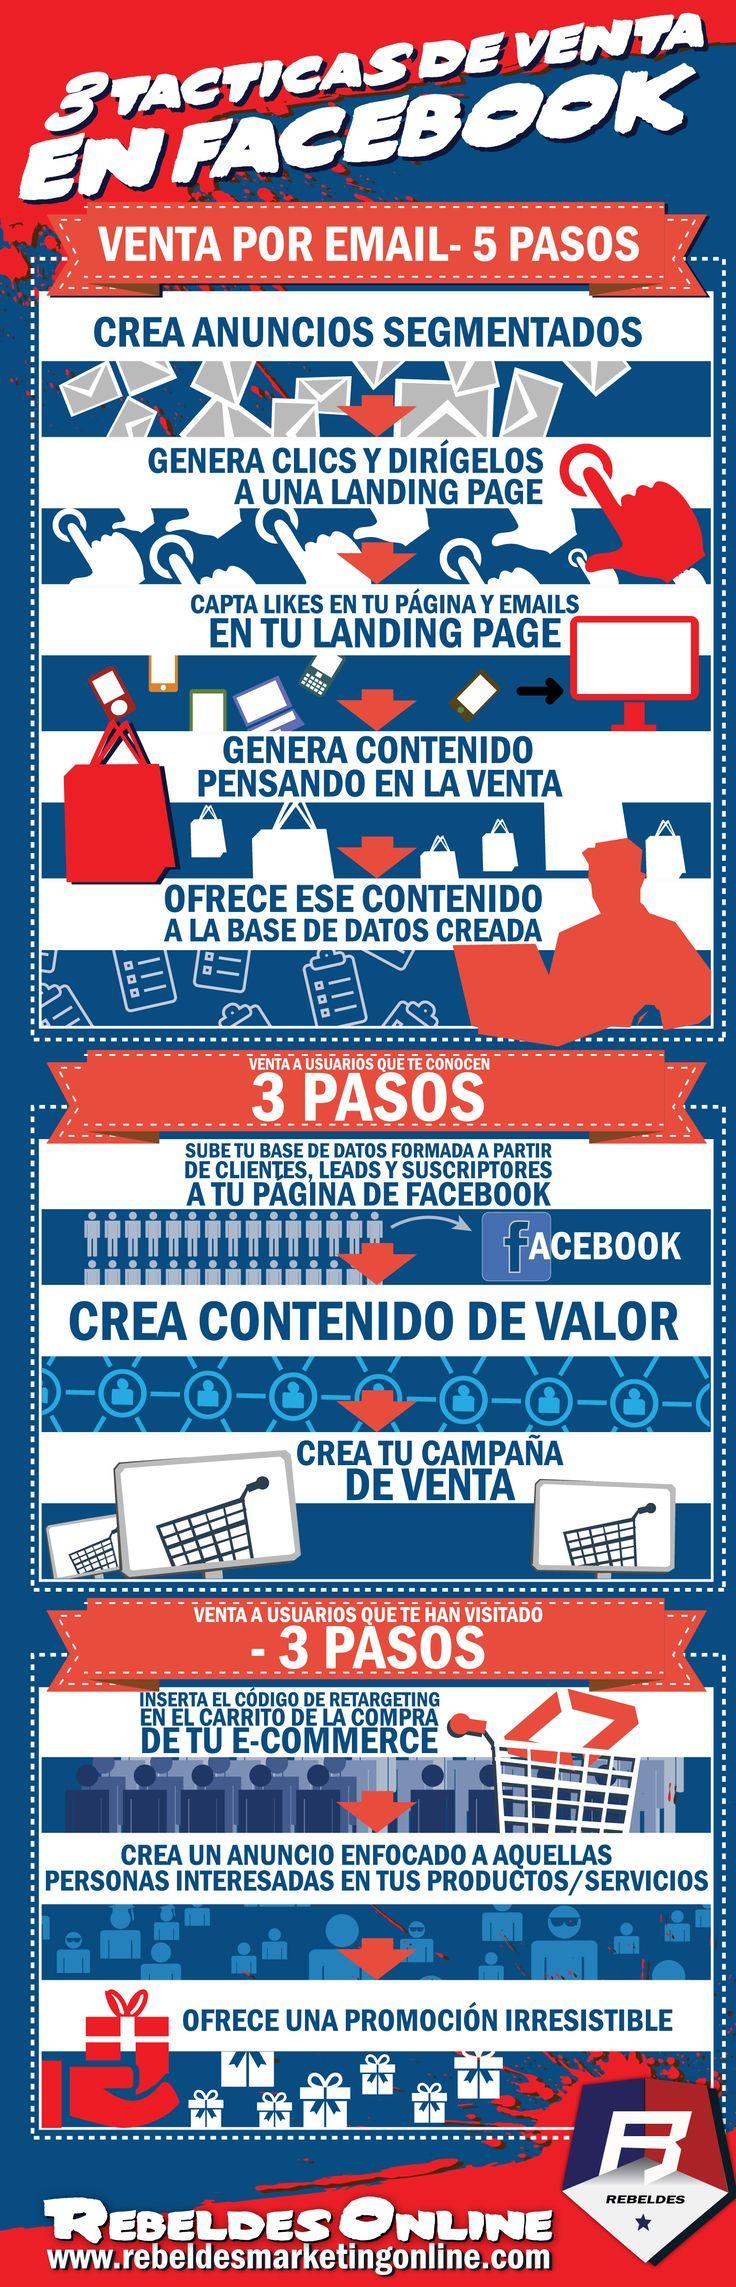 #infografia #infographic TACTICAS DE #VENTA EN #FACEBOOK http://www.rebeldesmarketingonline.com/